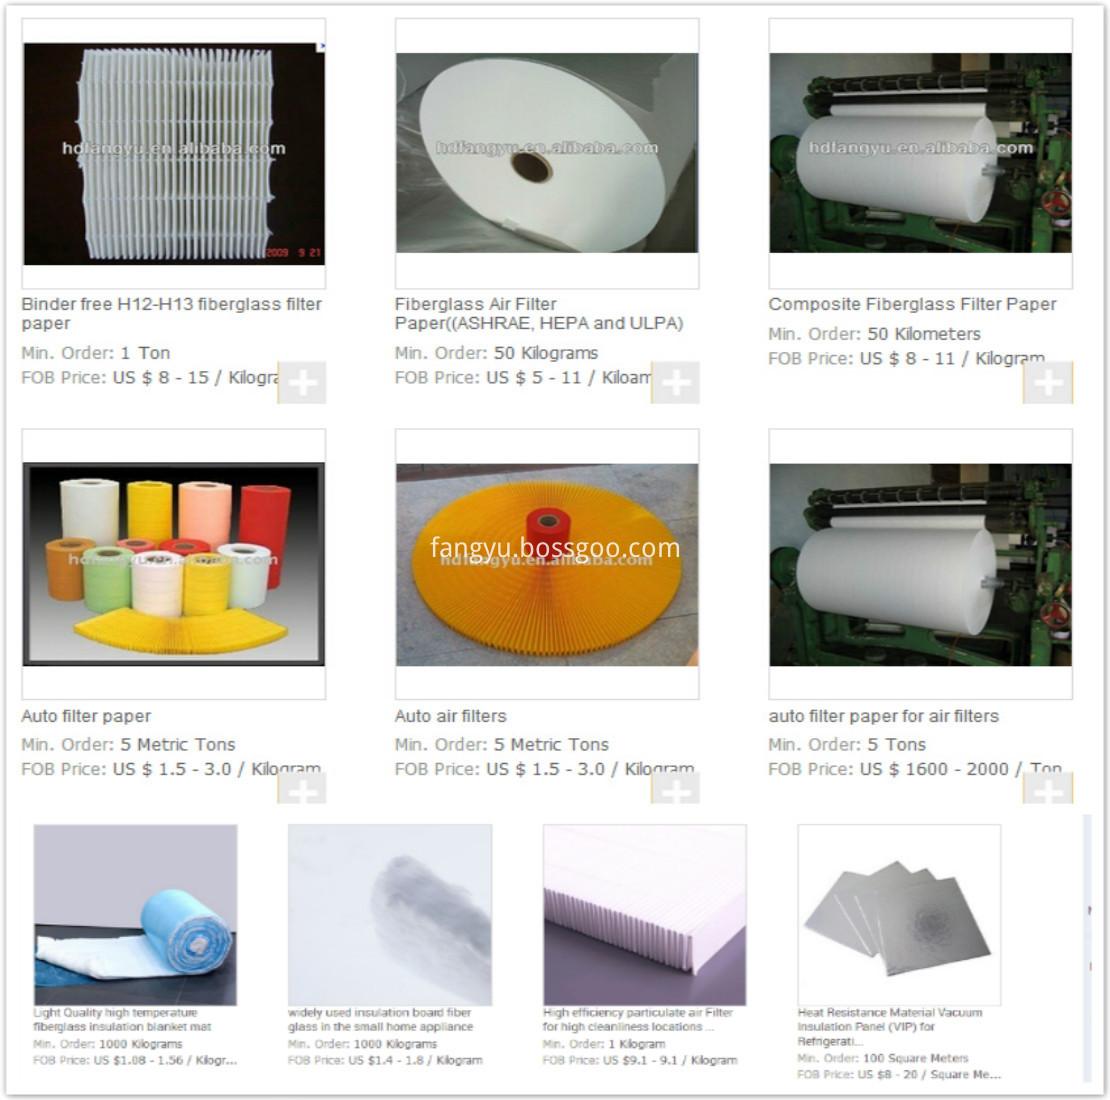 Glas S Microfiber Liquid Filter Media